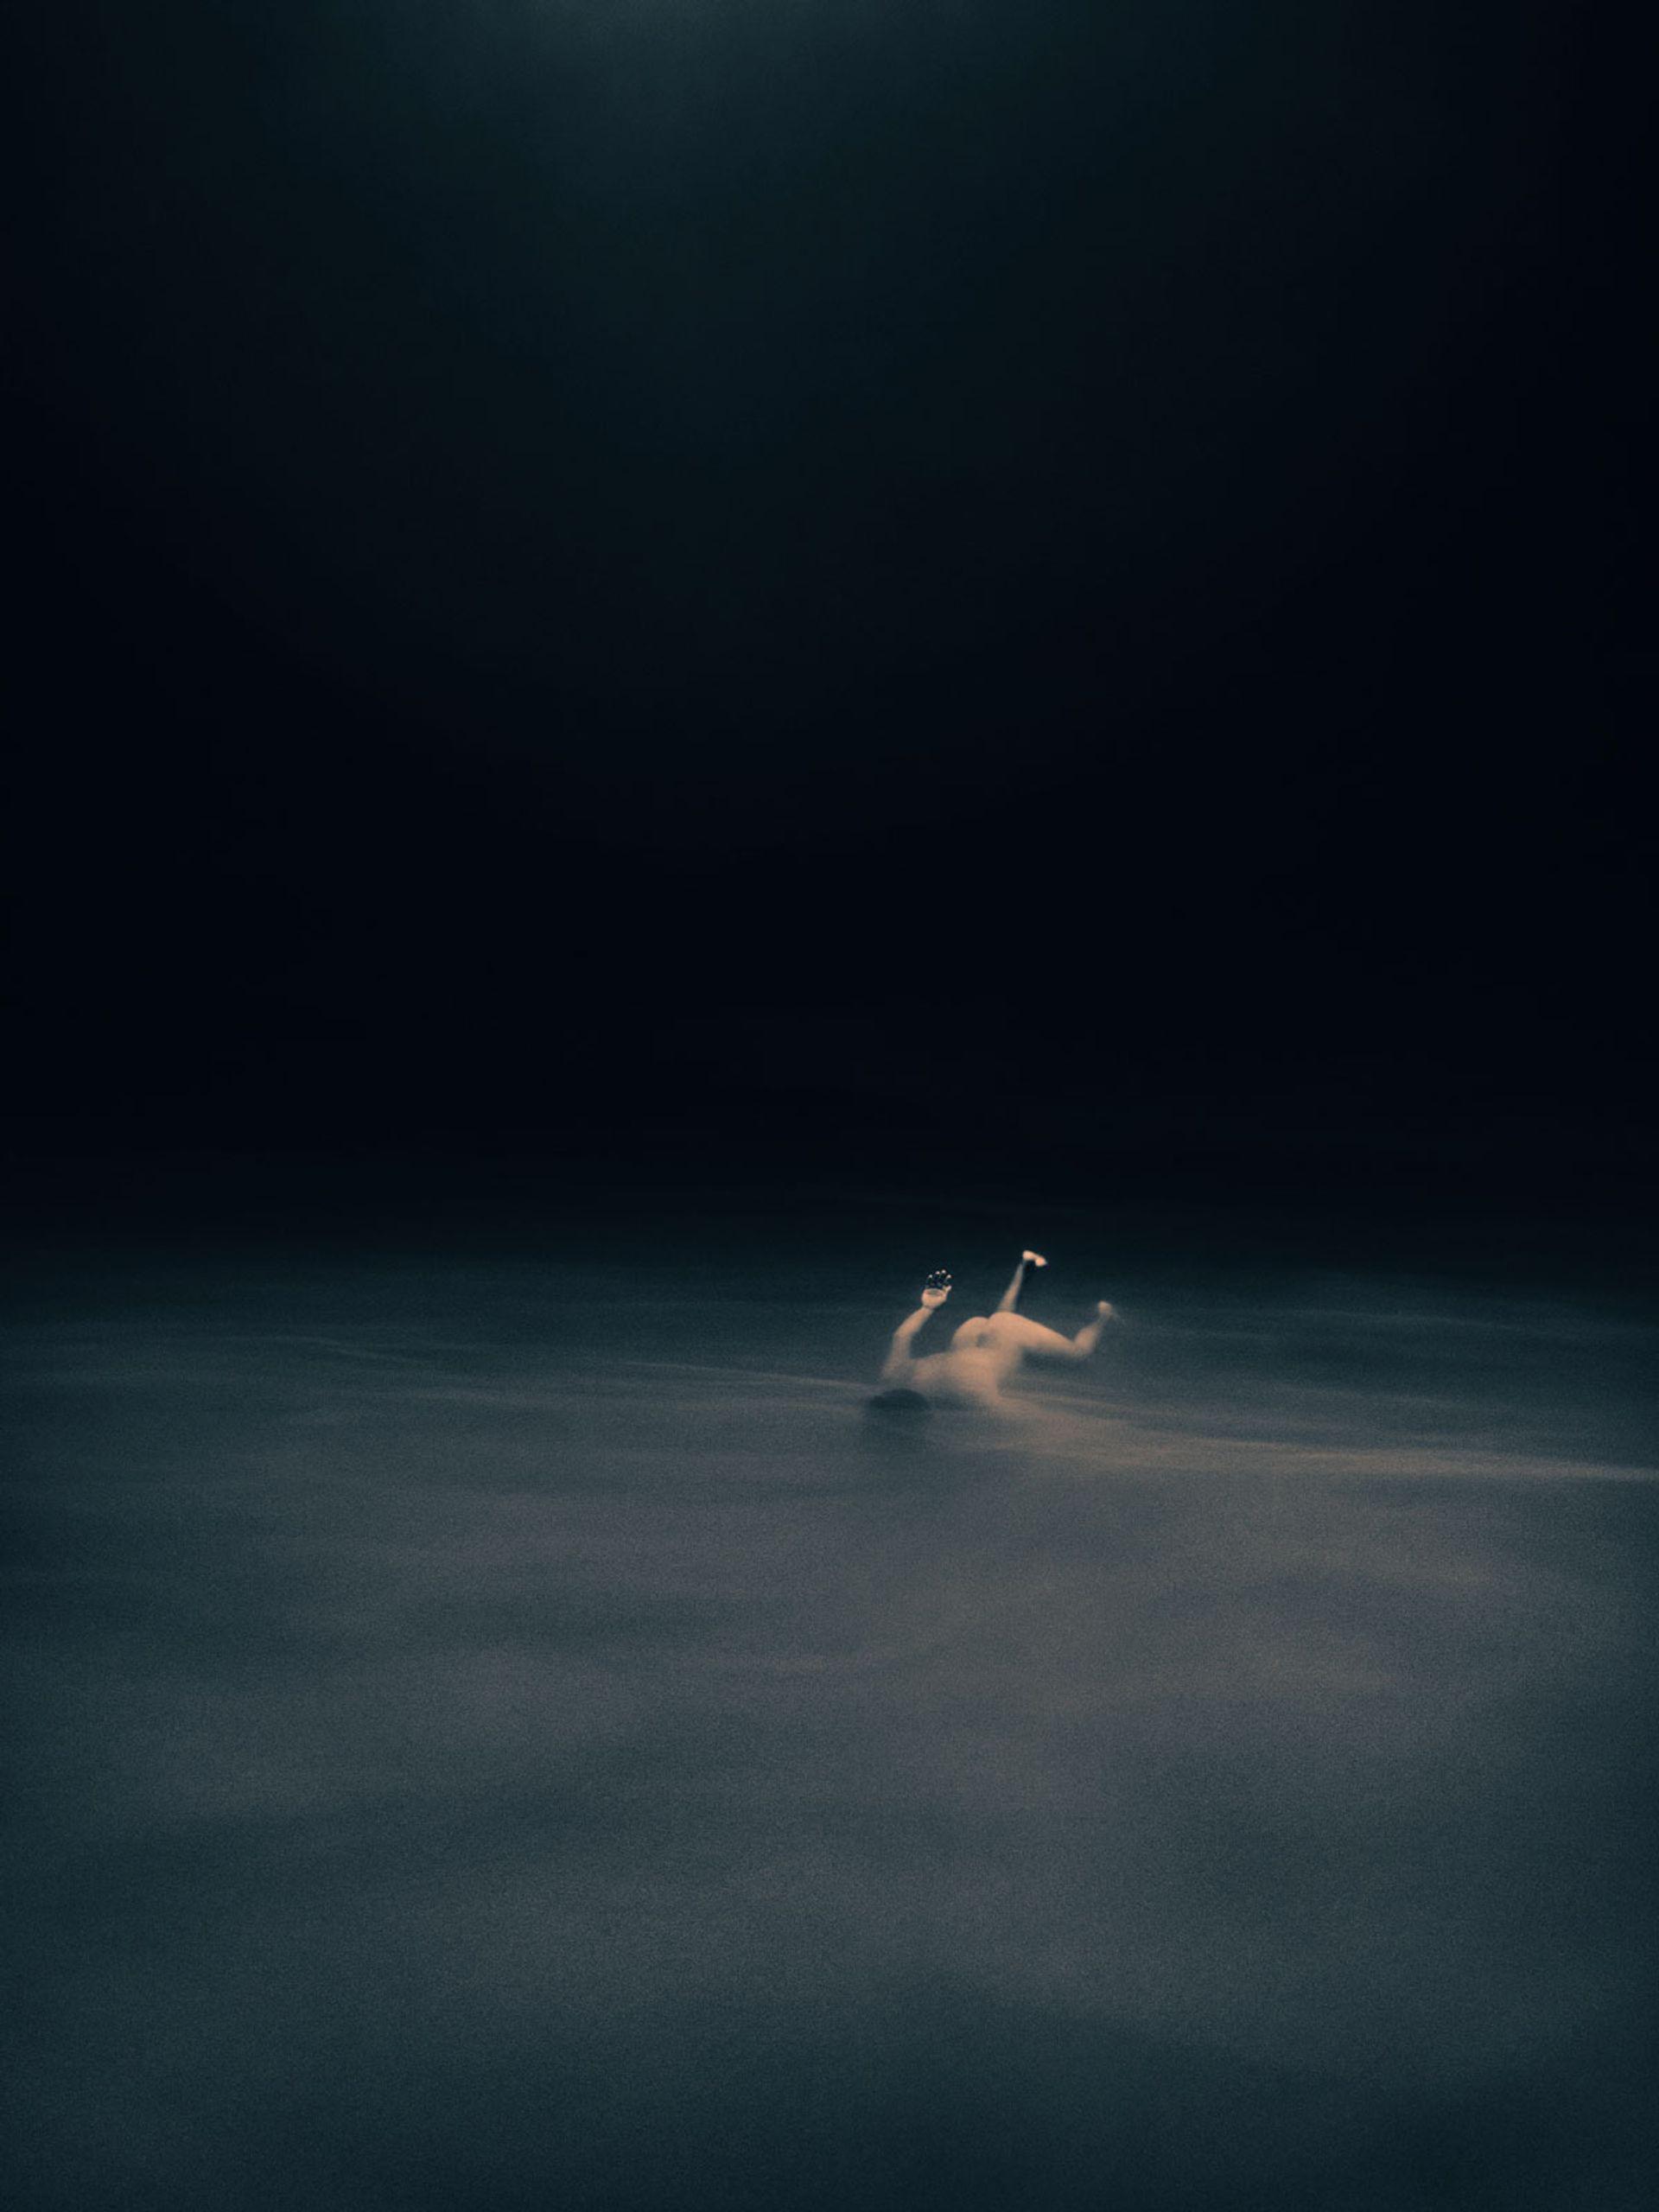 Julian Charrière's Where Waters Meet (3.77 atmospheres) (2019) © Julian Charrière; VG Bild-Kunst, Bonn; Dittrich and Schlechtriem, Berlin